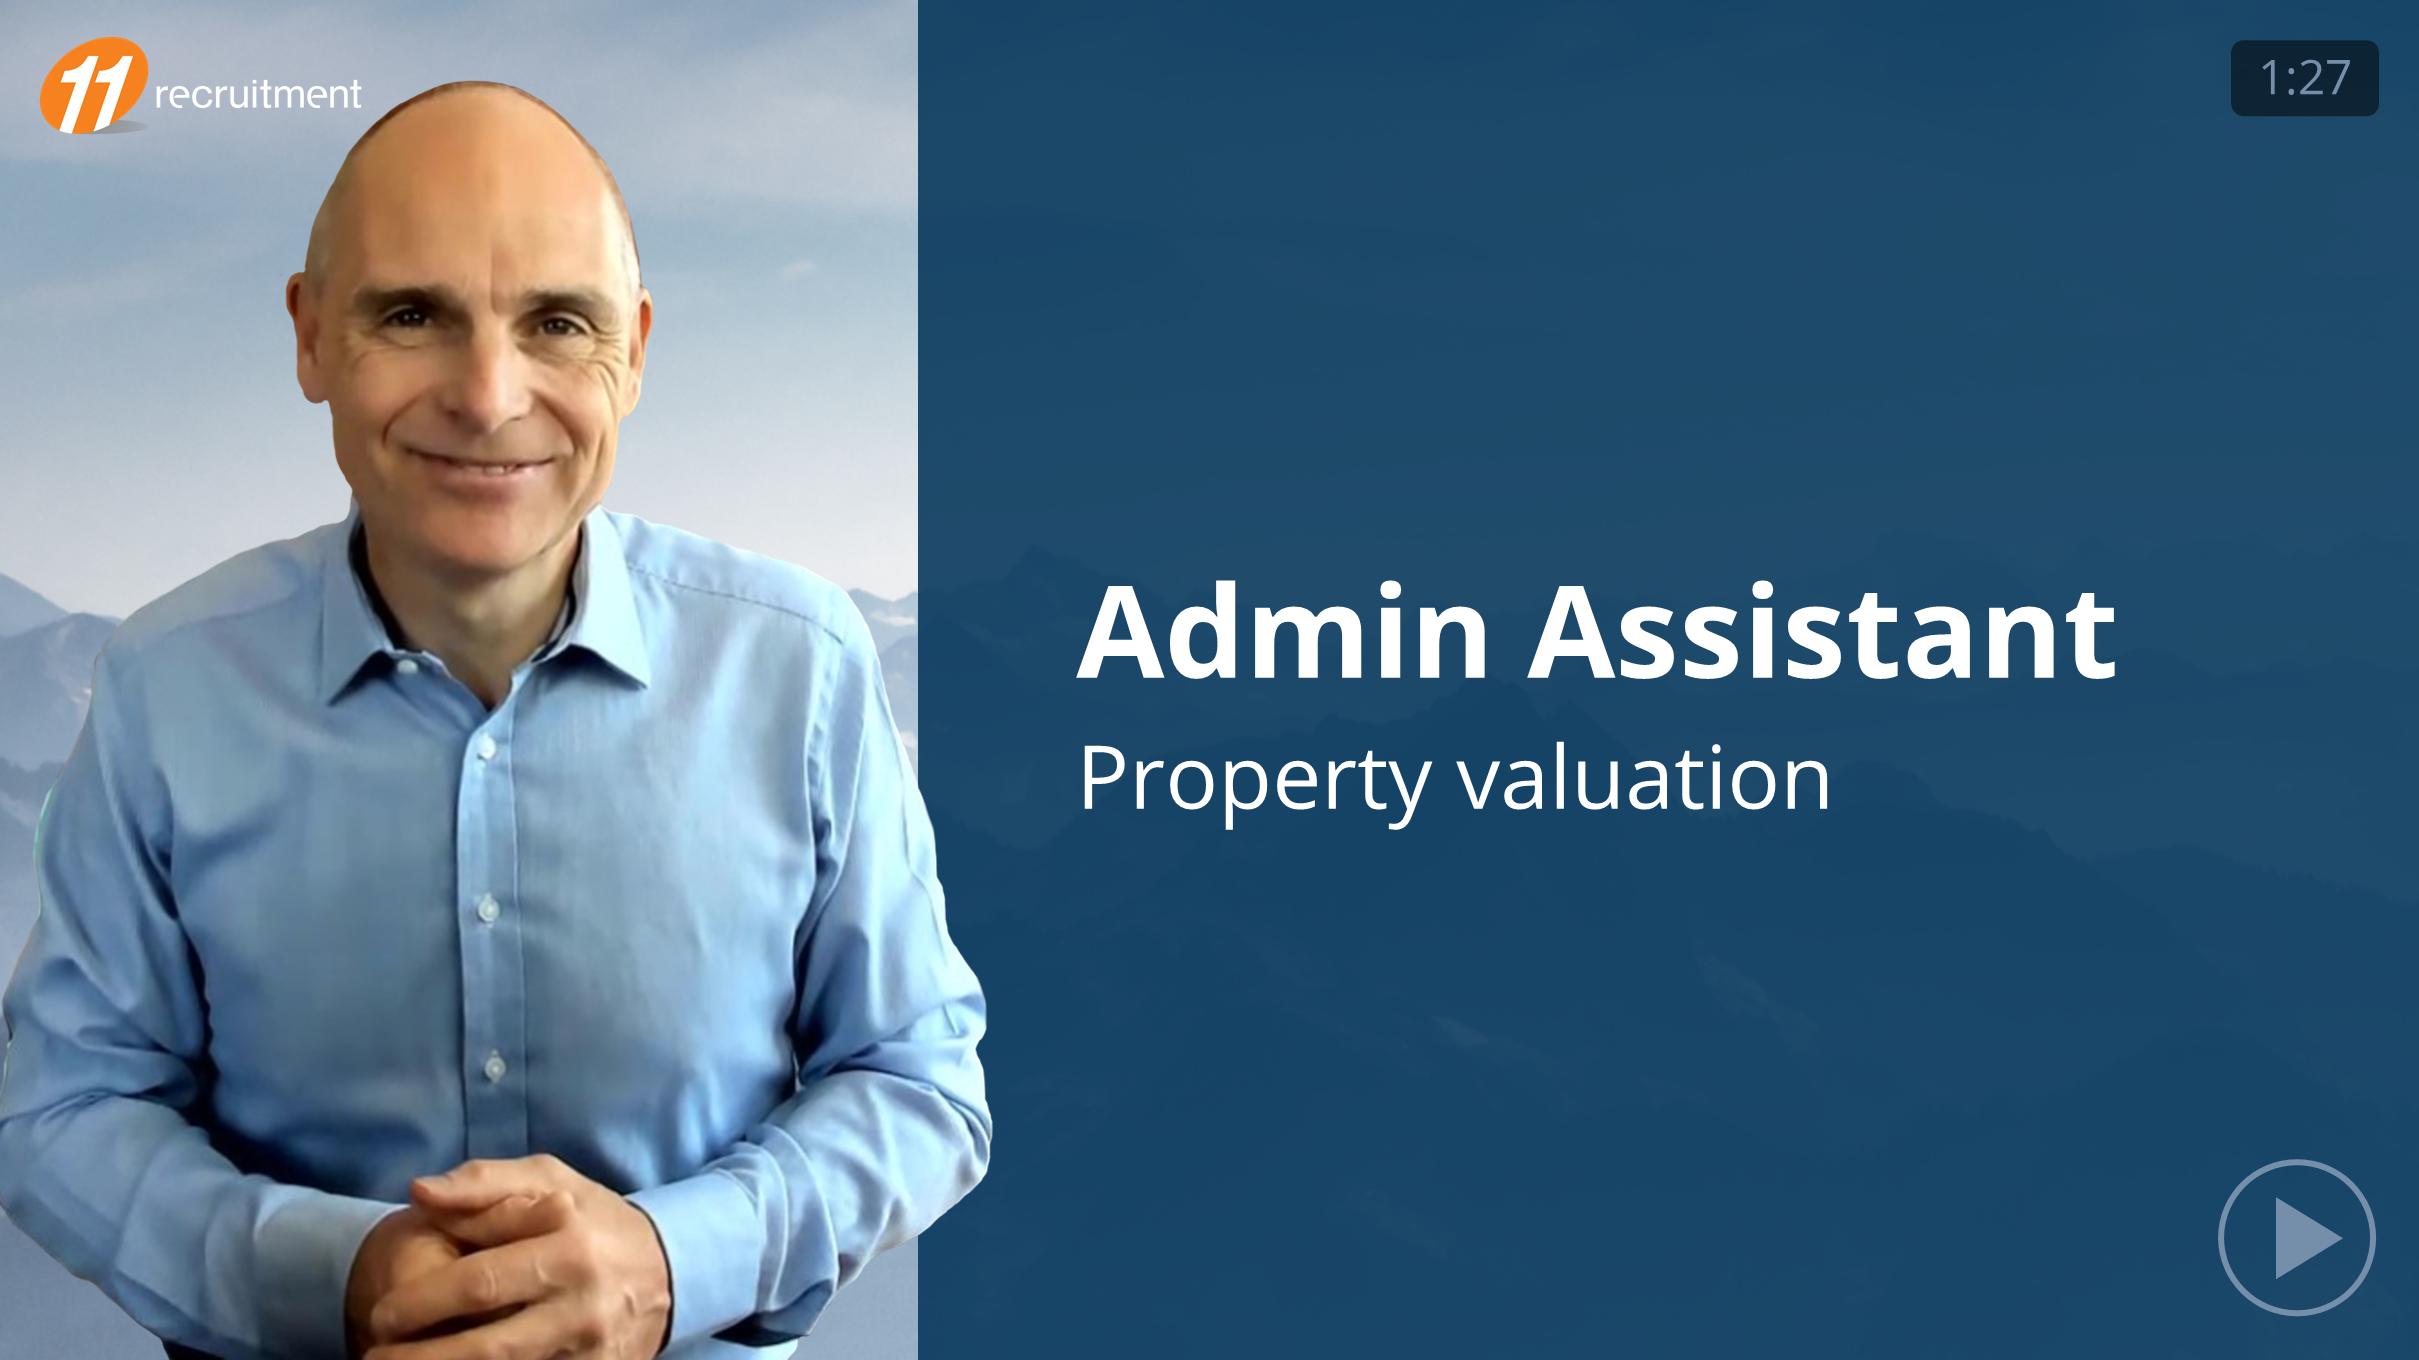 Admin Assistant - Property